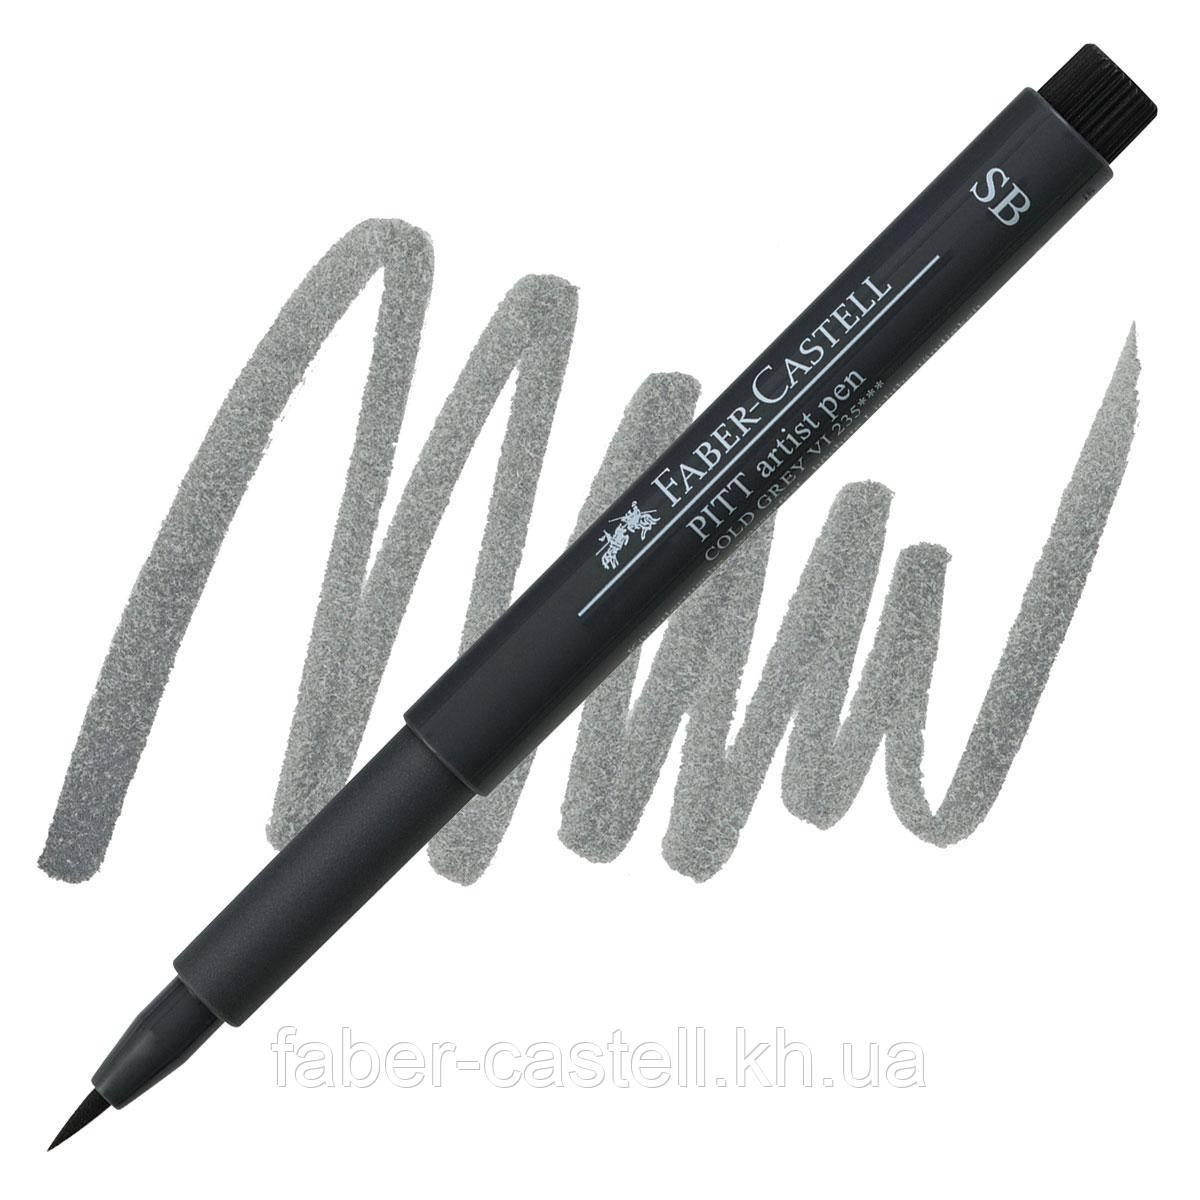 "Ручка-кисточка капиллярная Faber - Castell PITT® ARTIST PEN ""SOFT BRUSH"" № 235 холодный серый VI , 167835"